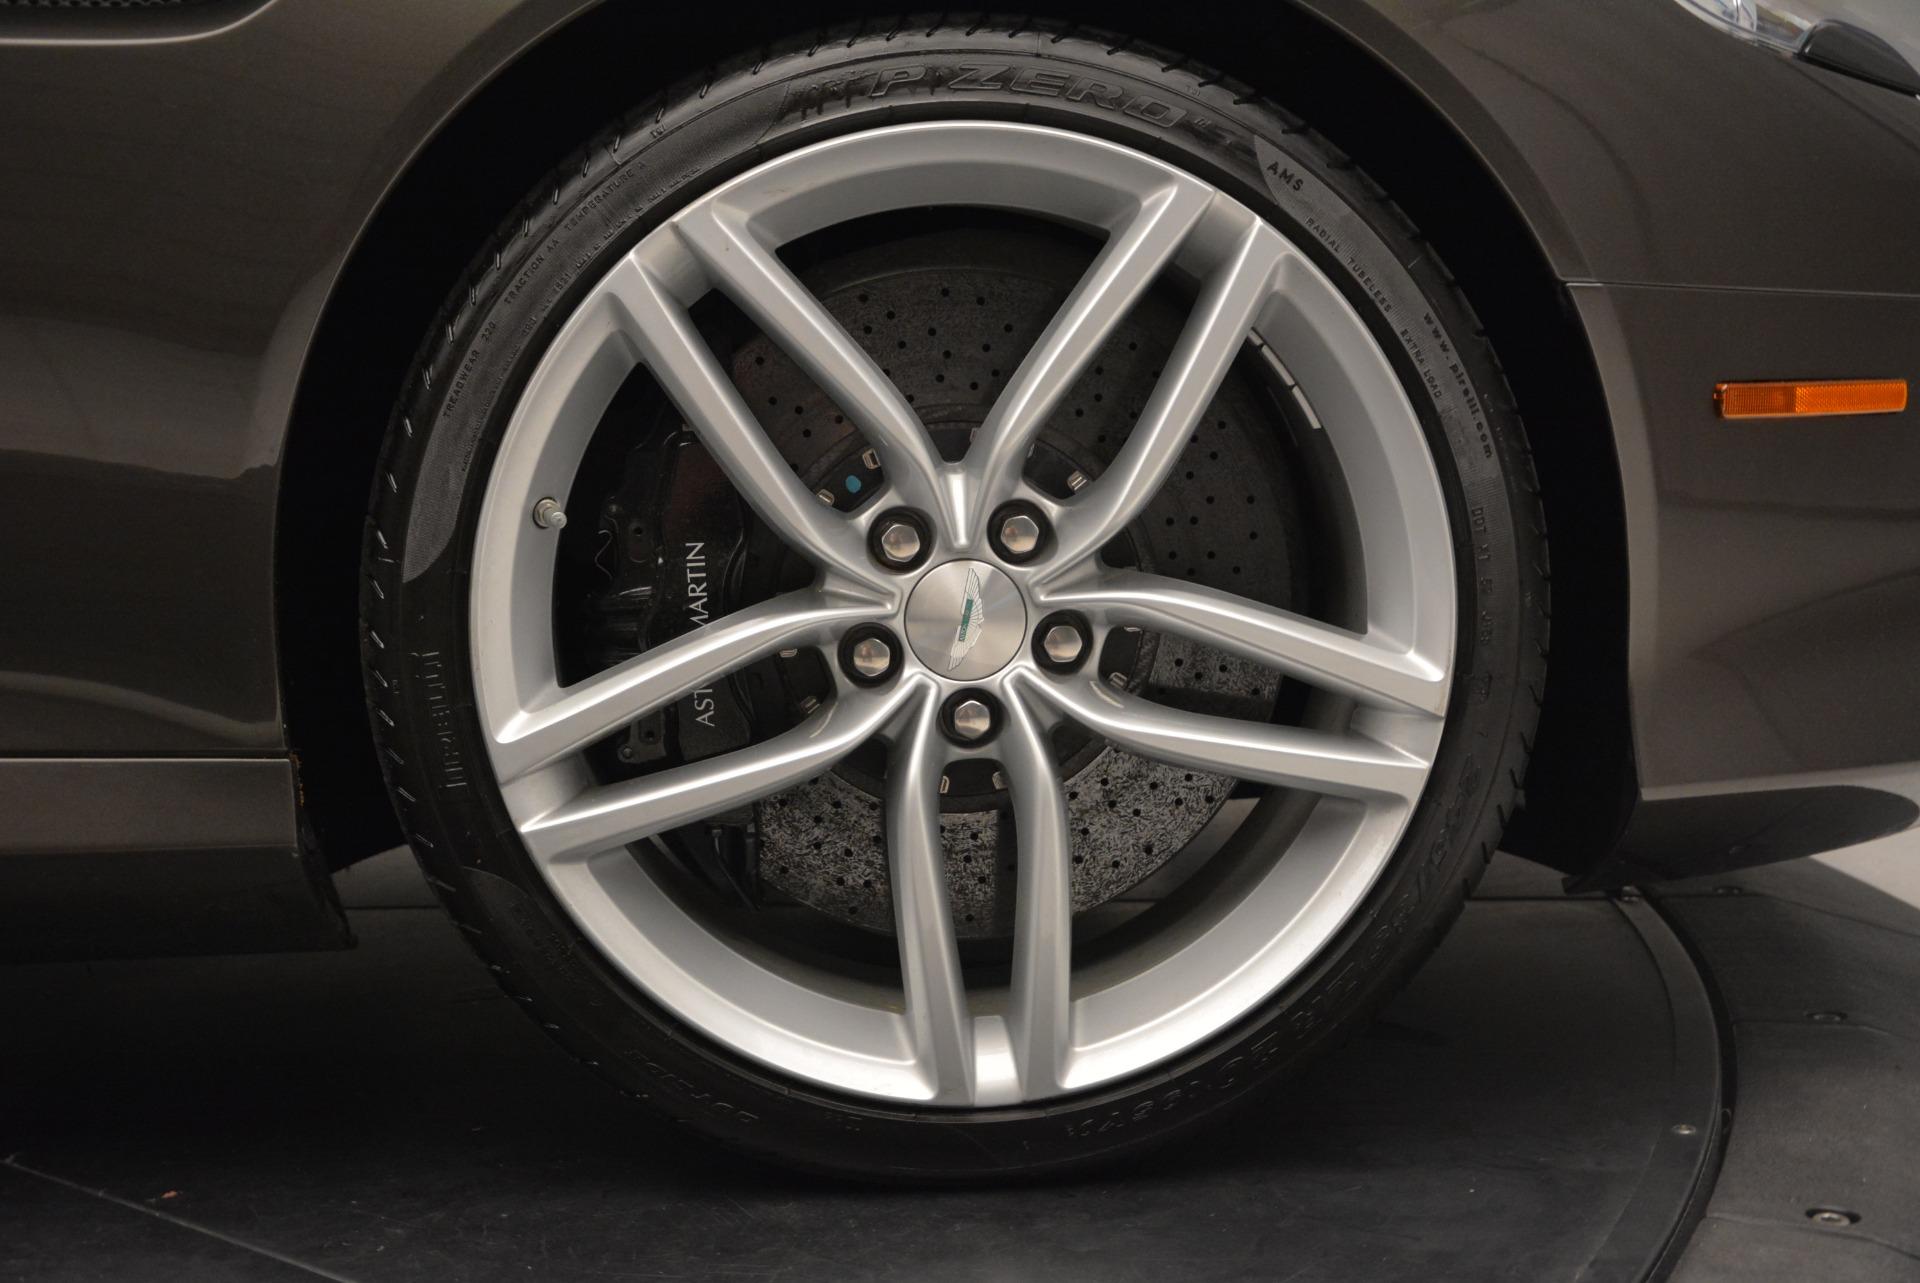 Used 2012 Aston Martin Virage Convertible For Sale In Greenwich, CT. Alfa Romeo of Greenwich, 7613 3351_p26